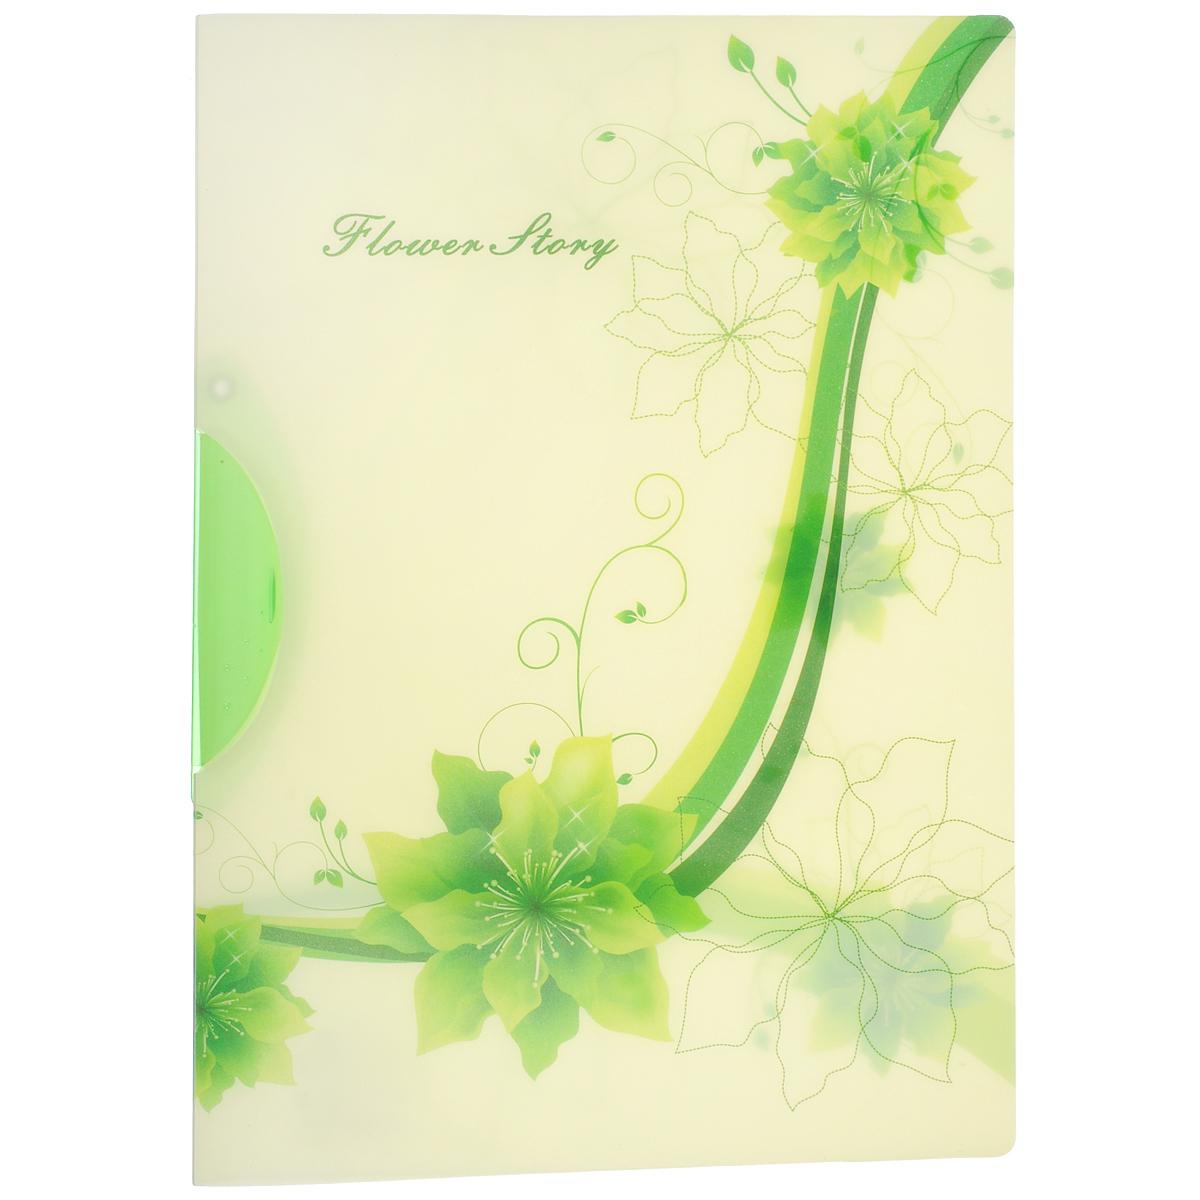 "Папка с клипом Centrum ""Flower Story"", цвет: зеленый. Формат А4 84135Сал"